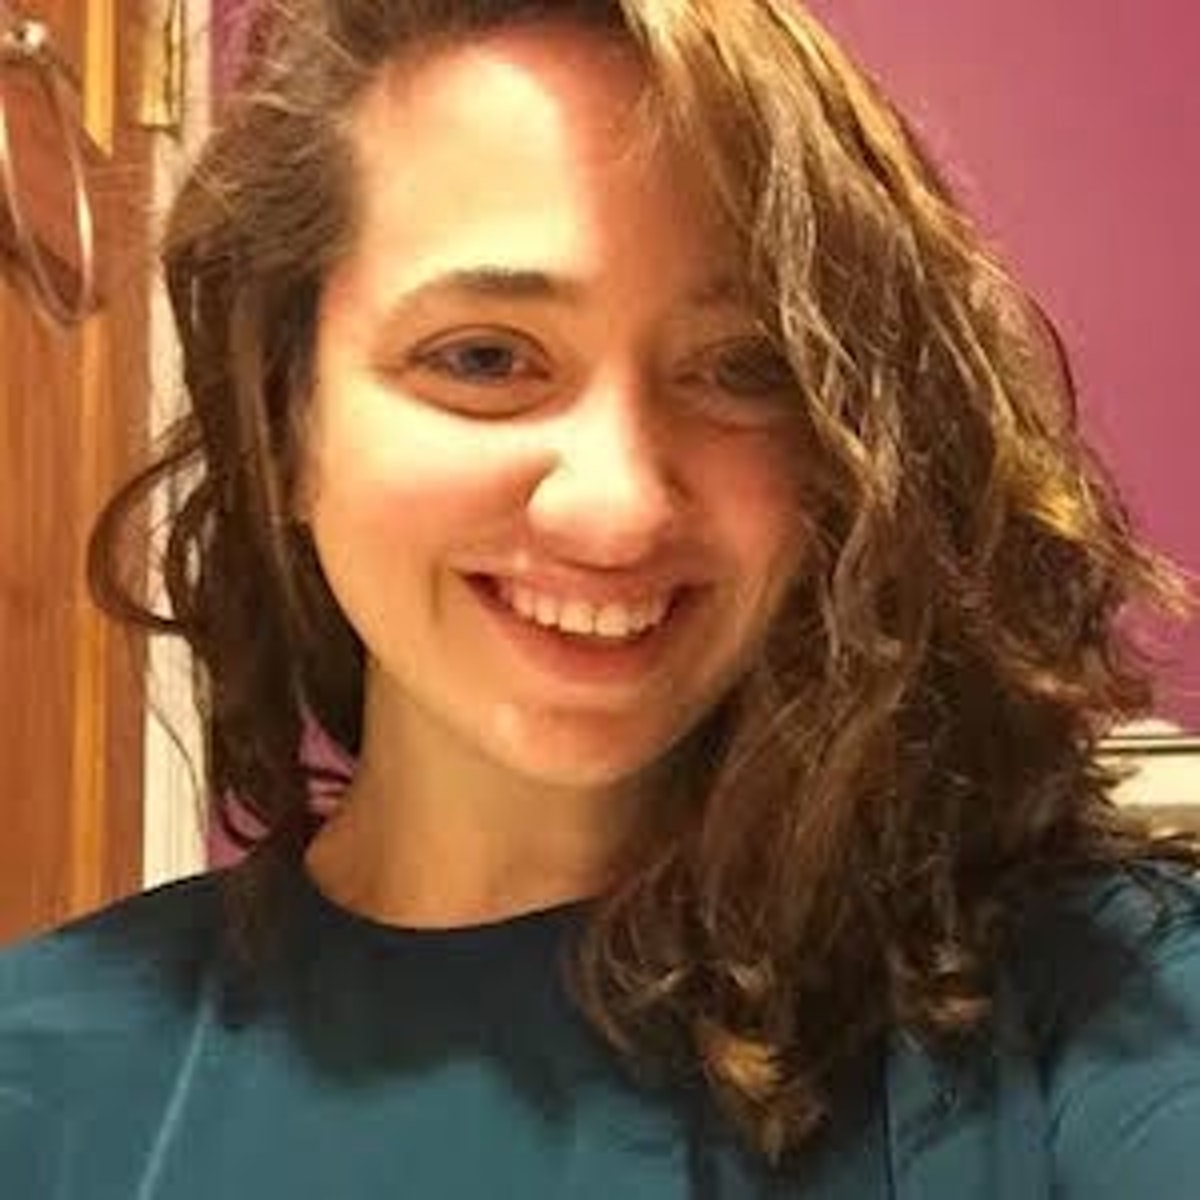 Emily Demirjian